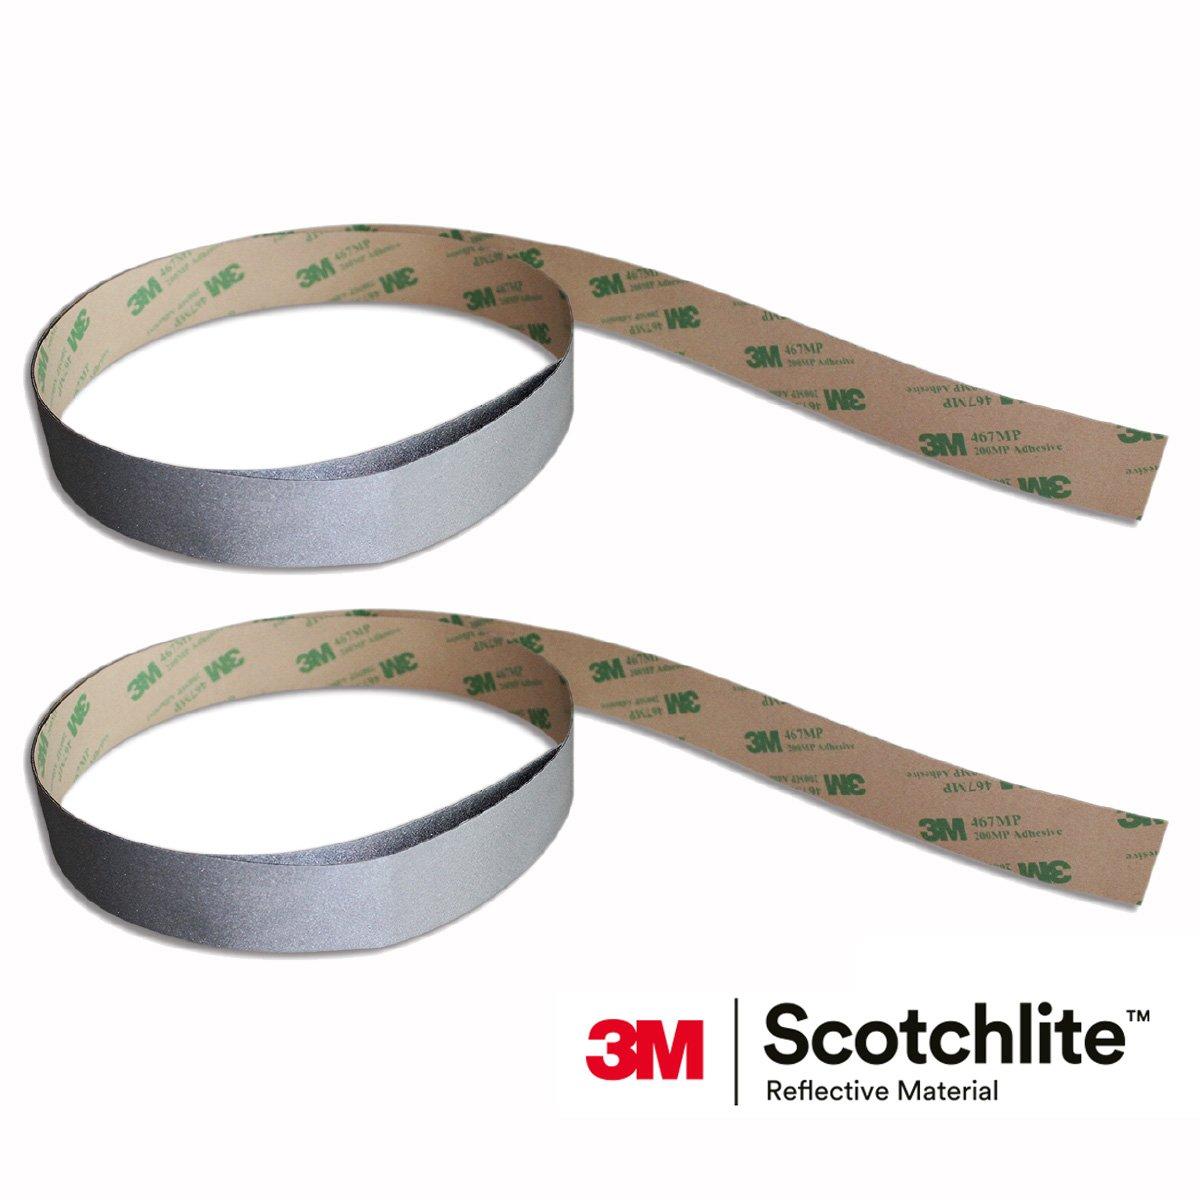 Salzmann 3M Scotchlite Reflective Sticker, High Visible Stickers, Silver, 1'' x 39'', 2 Rolls